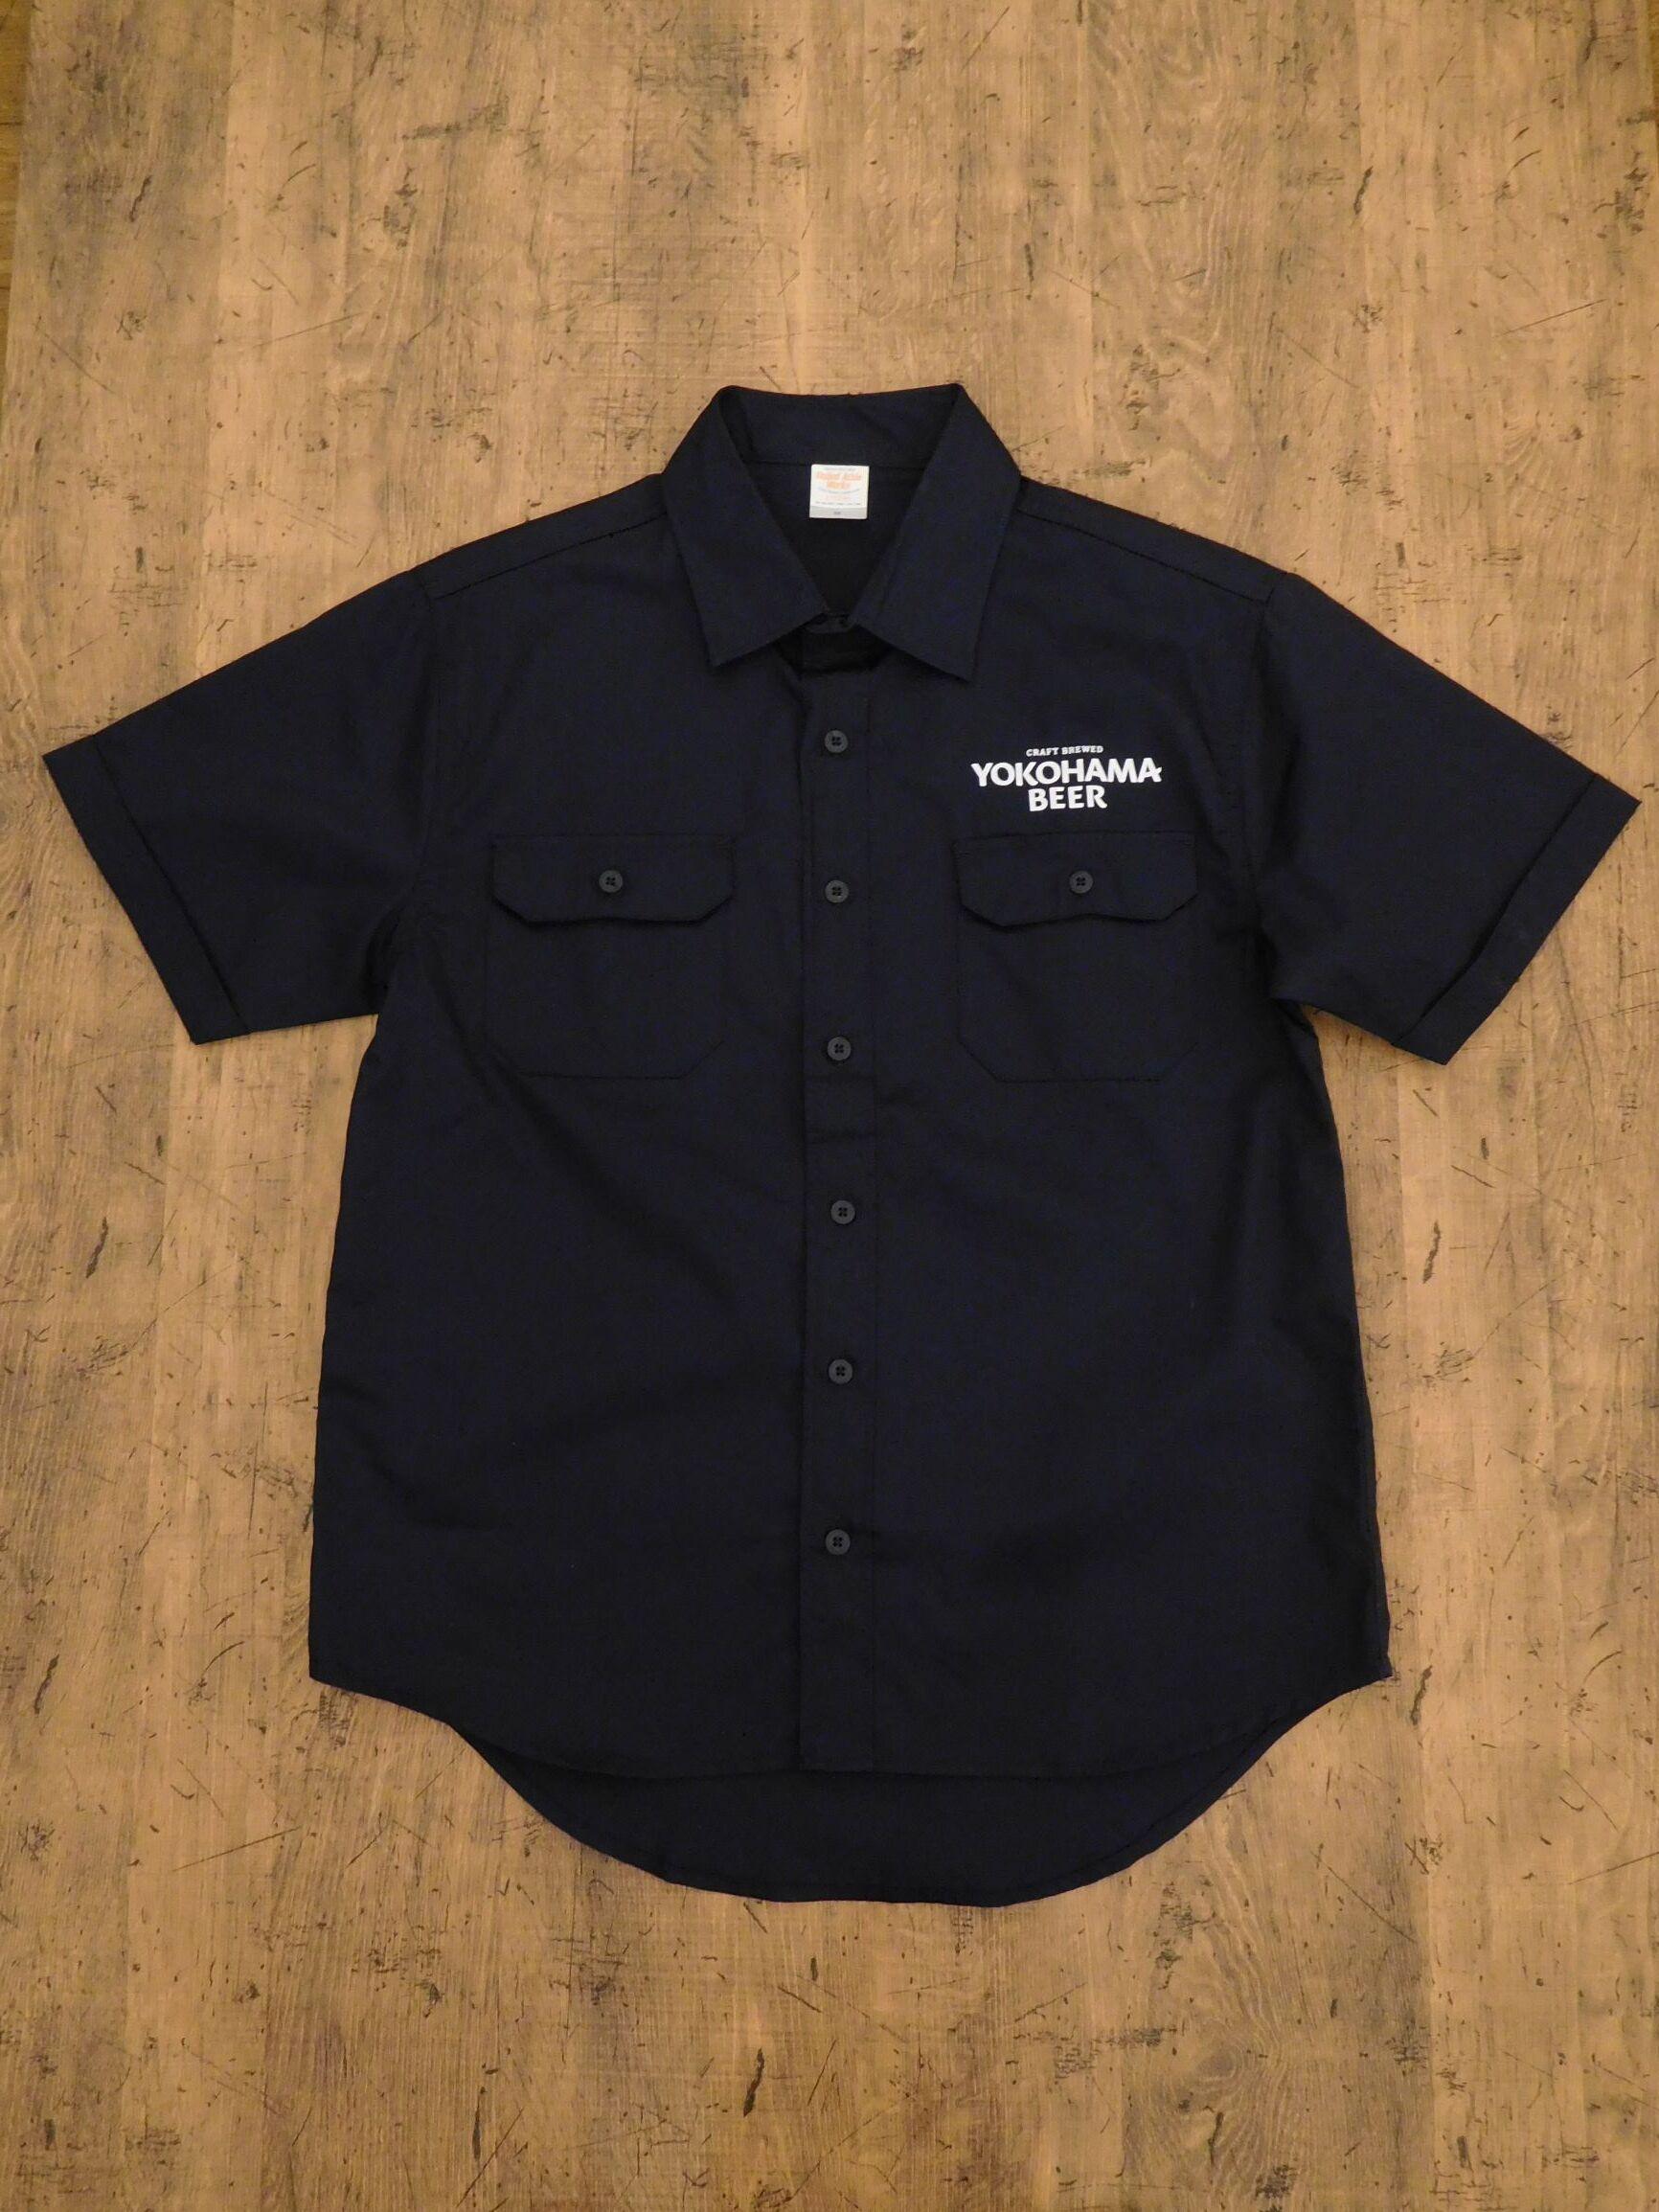 YOKOHAMA BEERロゴ work shirt